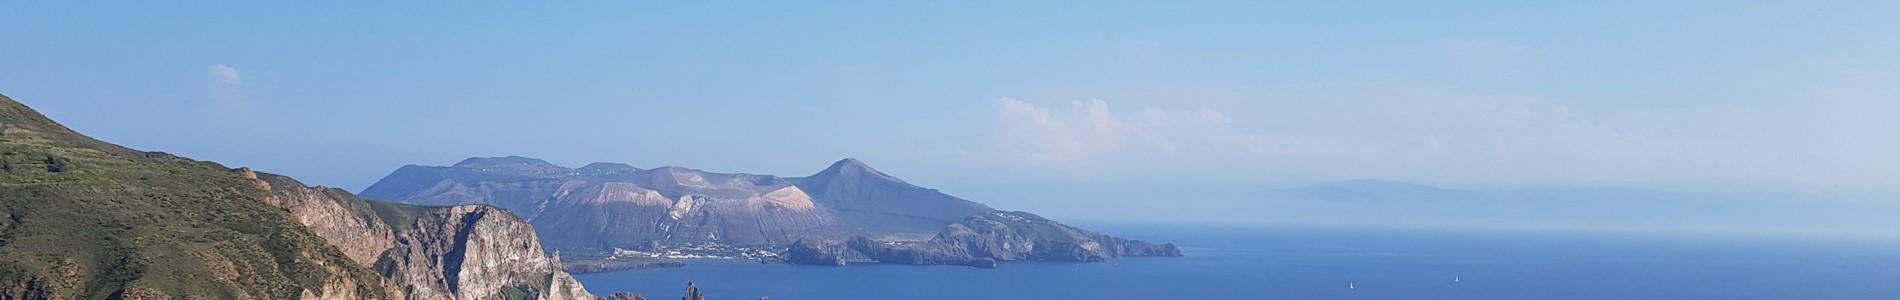 isole siciliane, miprendoemiportovia